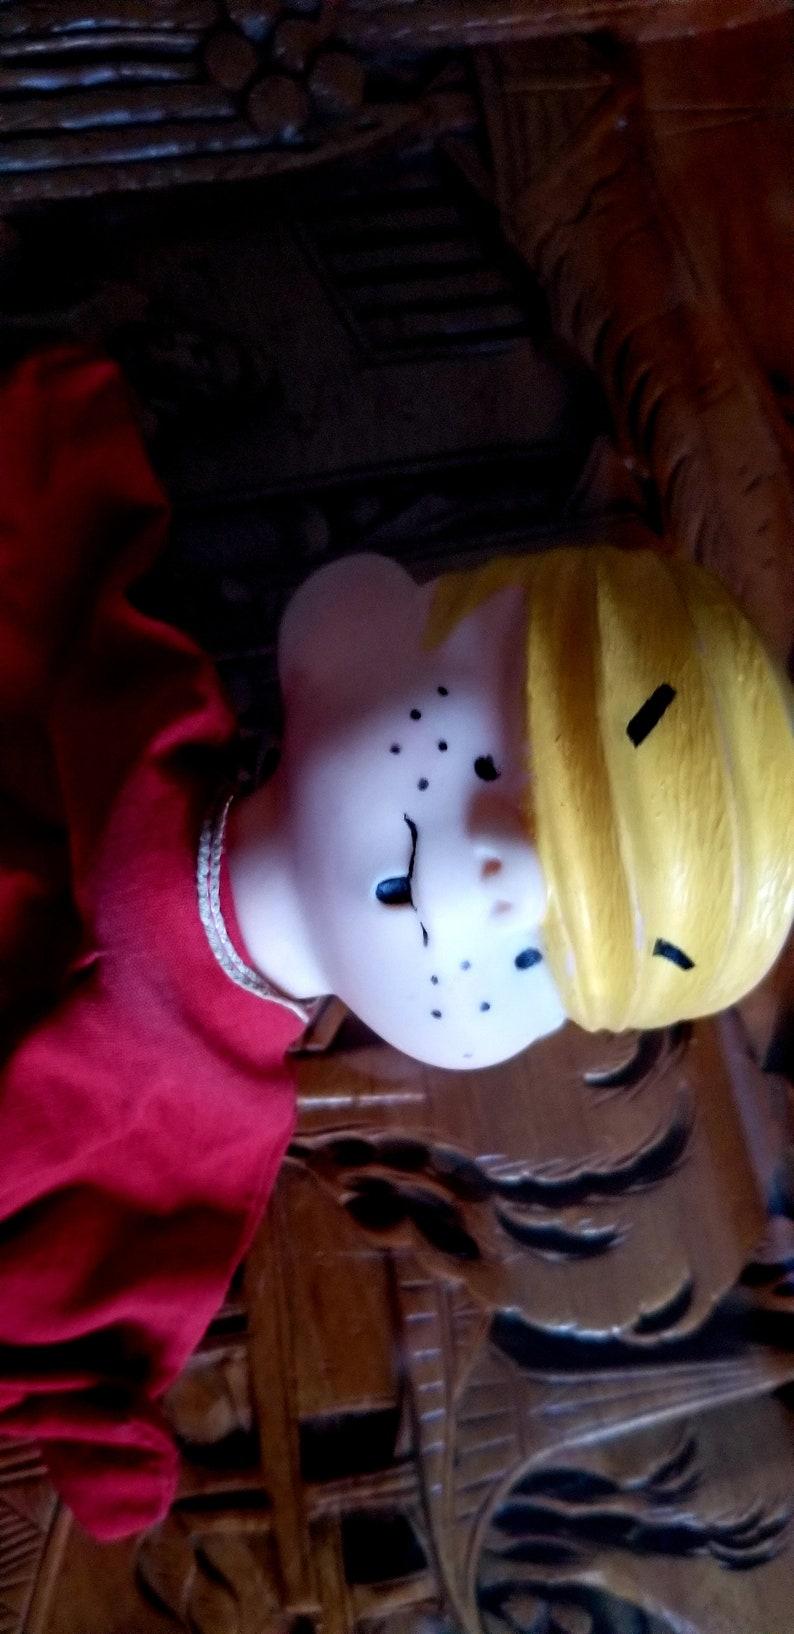 Vintage 1970s Dennis The Menace Hand Puppet